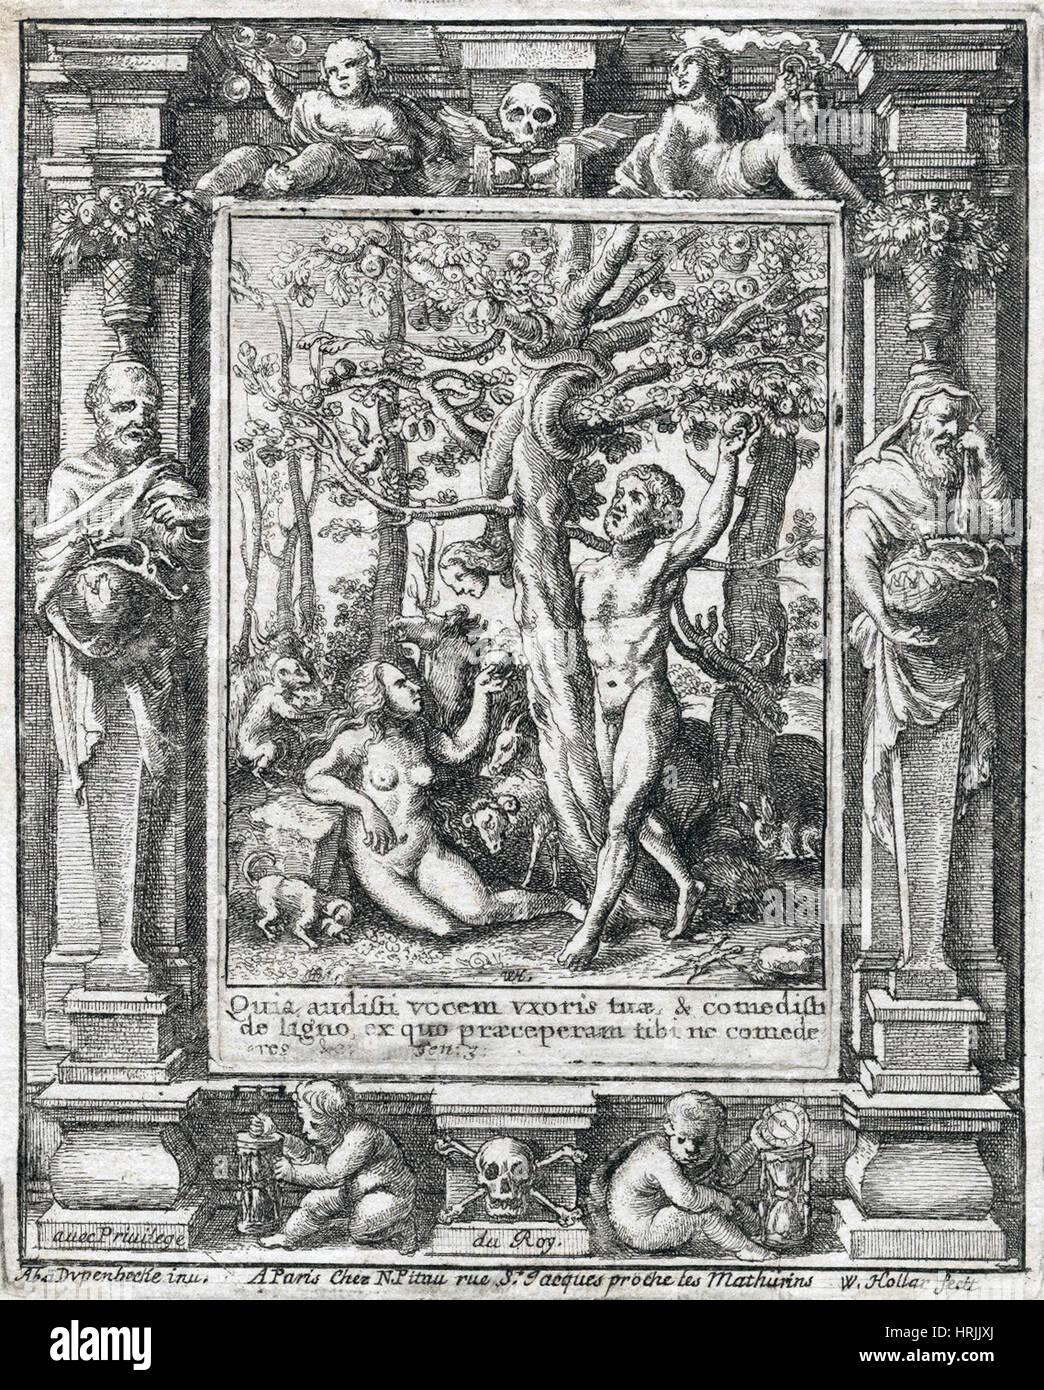 Garden of Eden - Stock Image